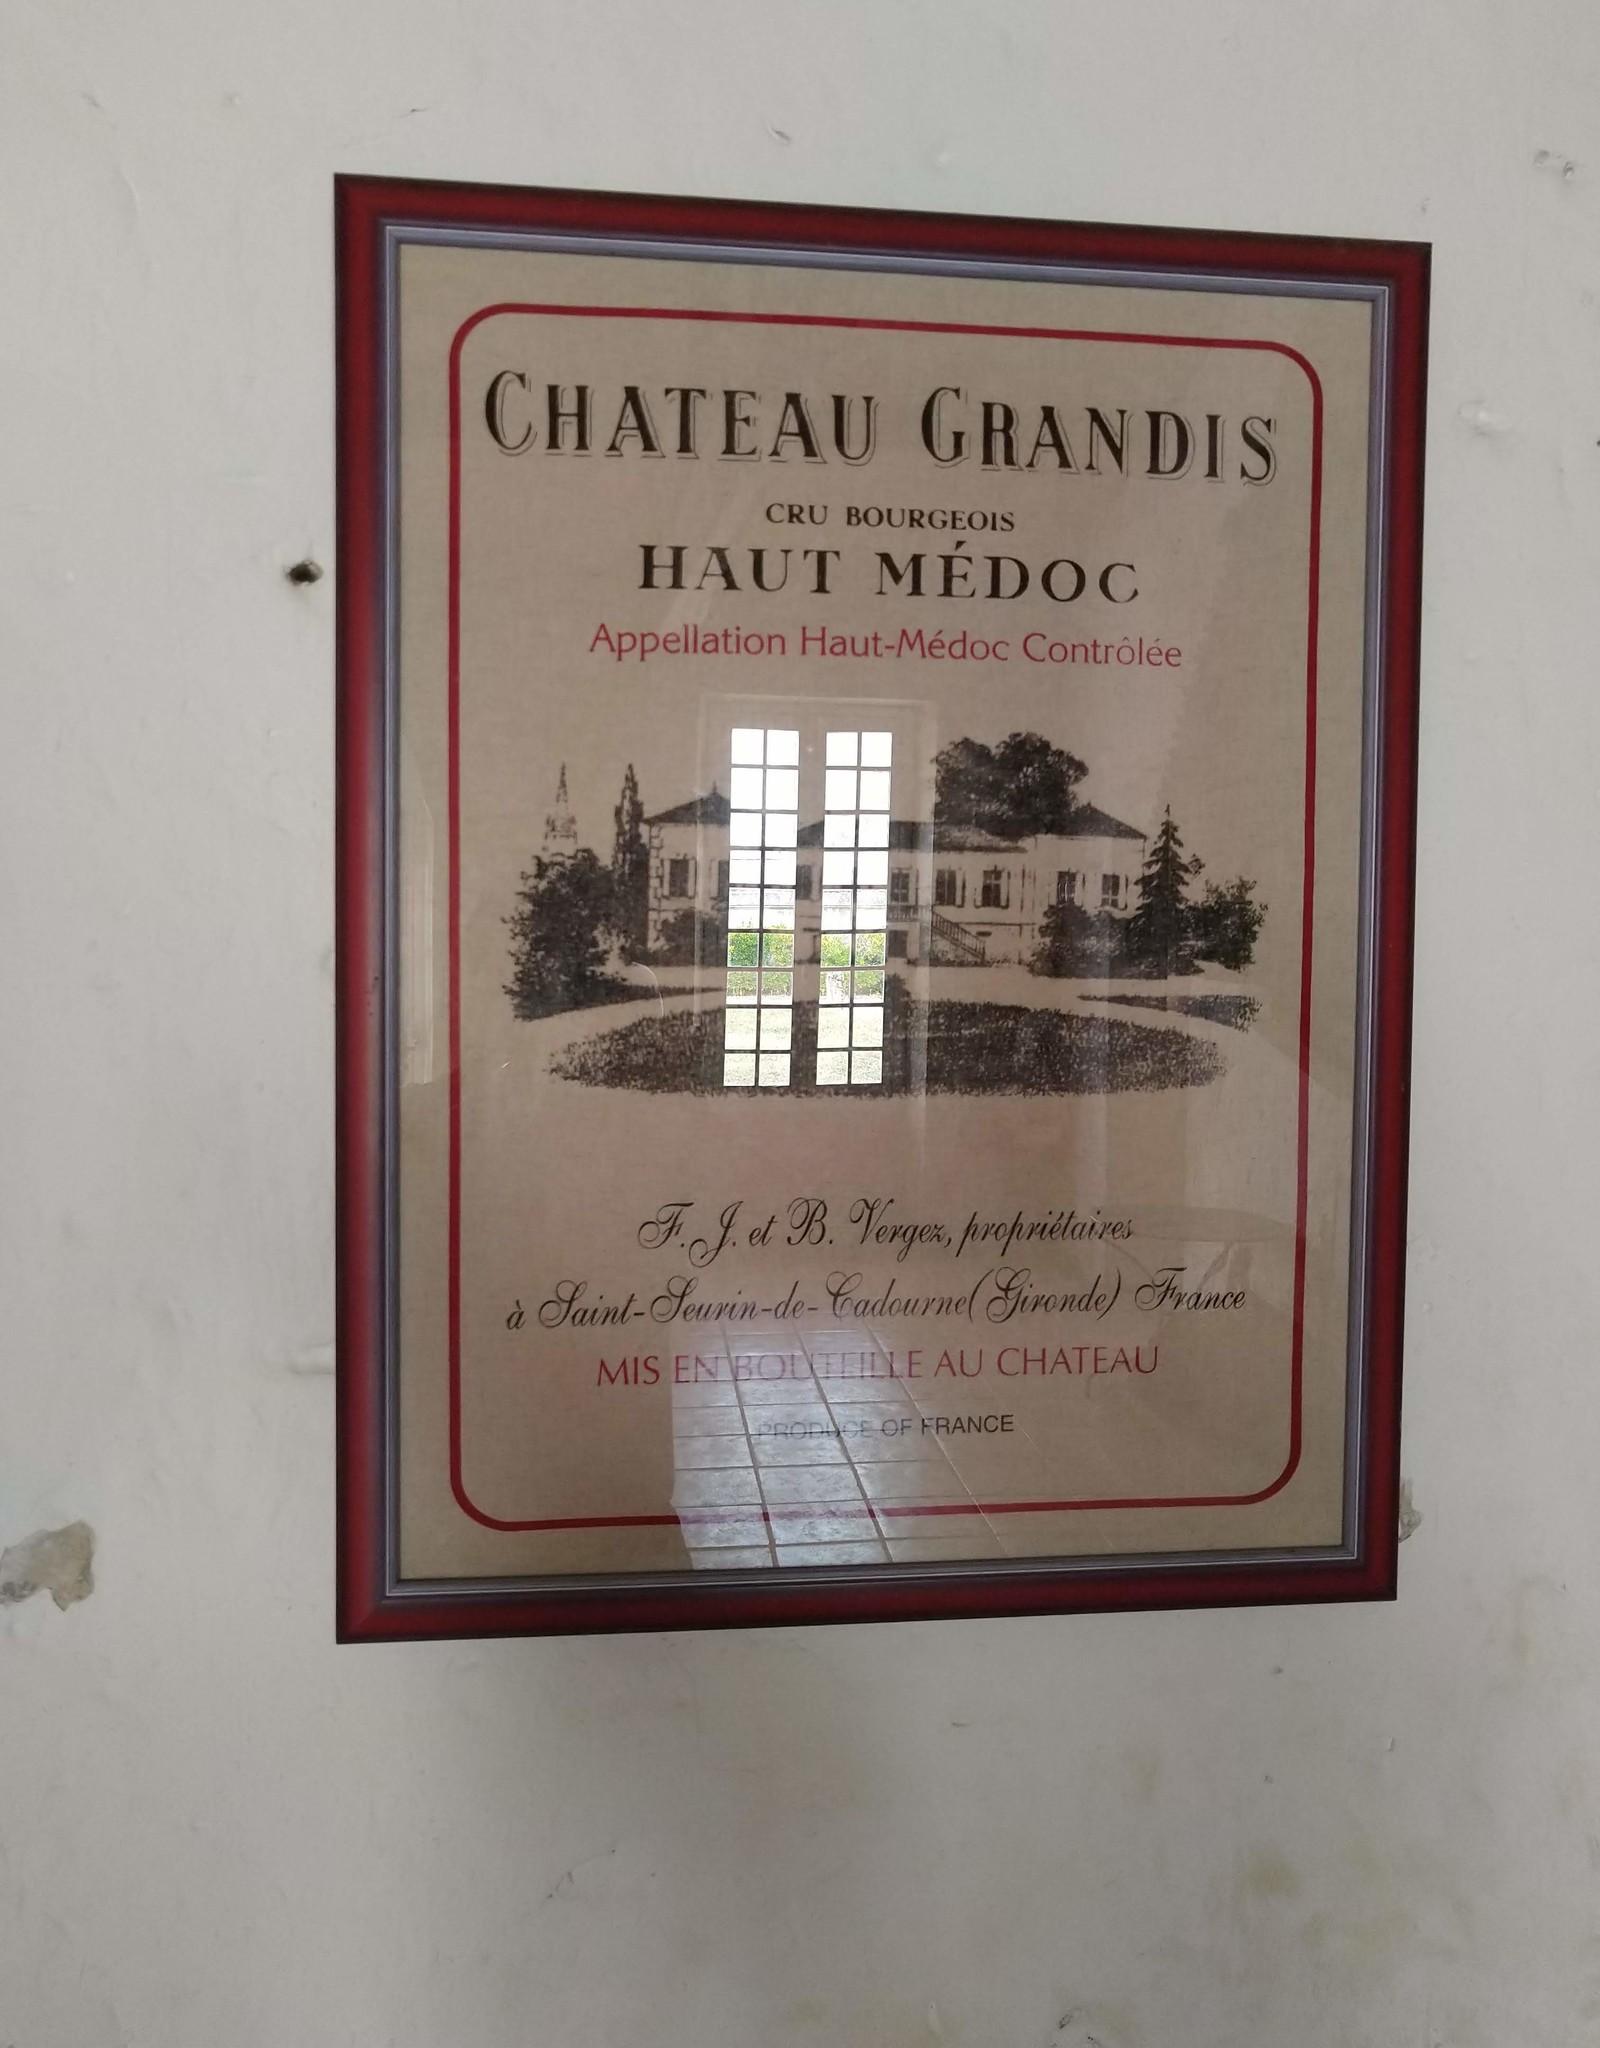 2009 Chateau Grandis, Haut Medoc